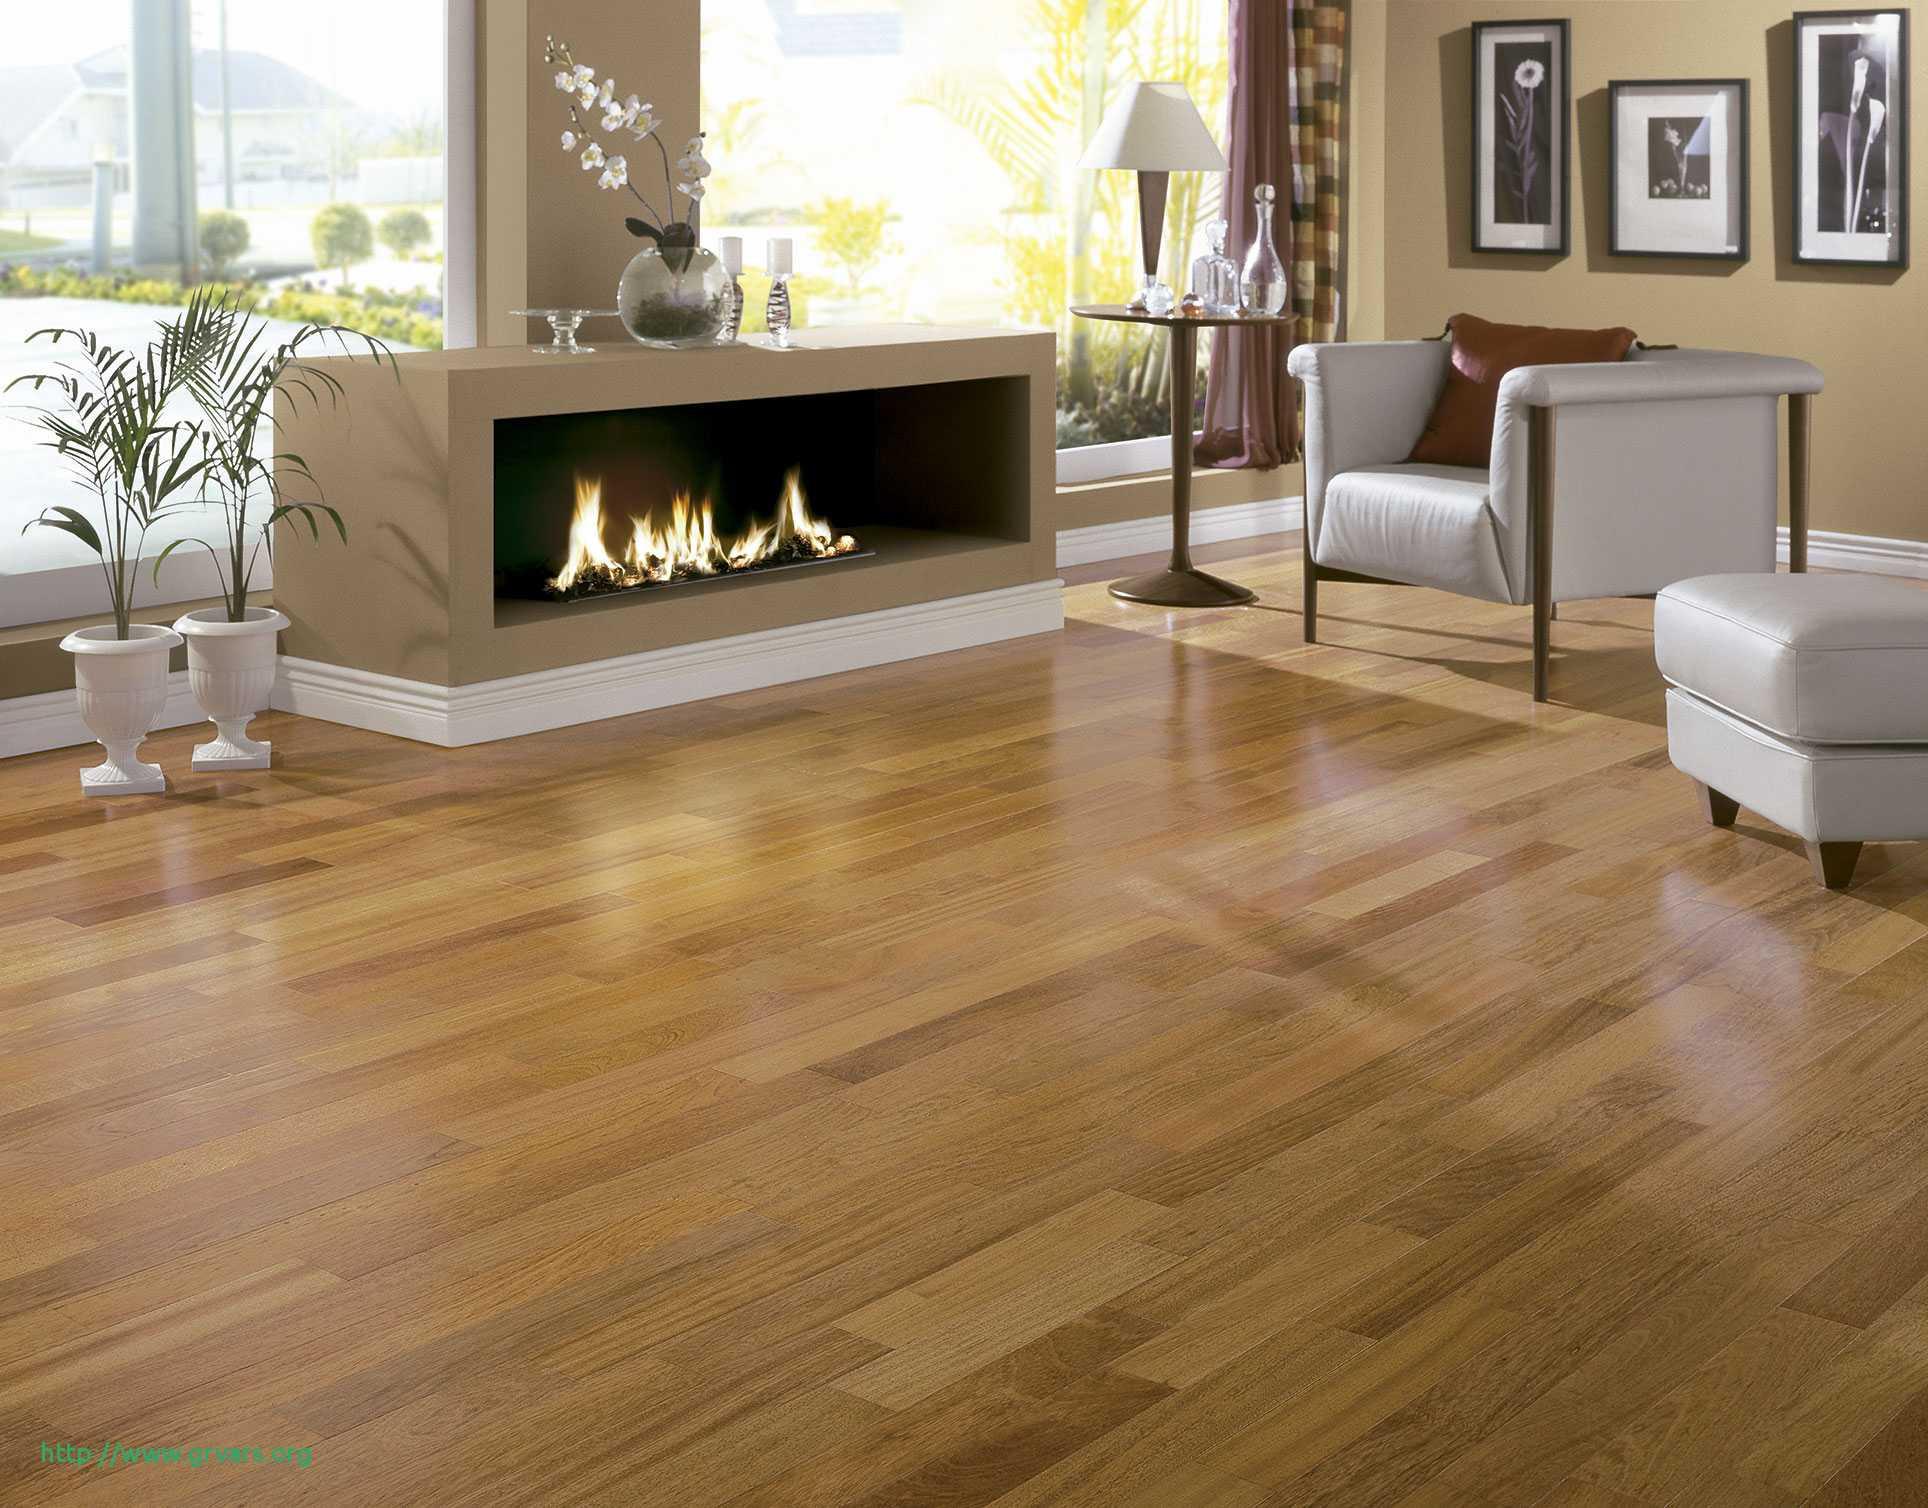 3 4 solid hardwood flooring of solid wood floor polish nouveau 3 4 x 3 1 4 tudor brazilian oak intended for solid wood floor polish inspirant engaging discount hardwood flooring 5 where to buy inspirational 0d